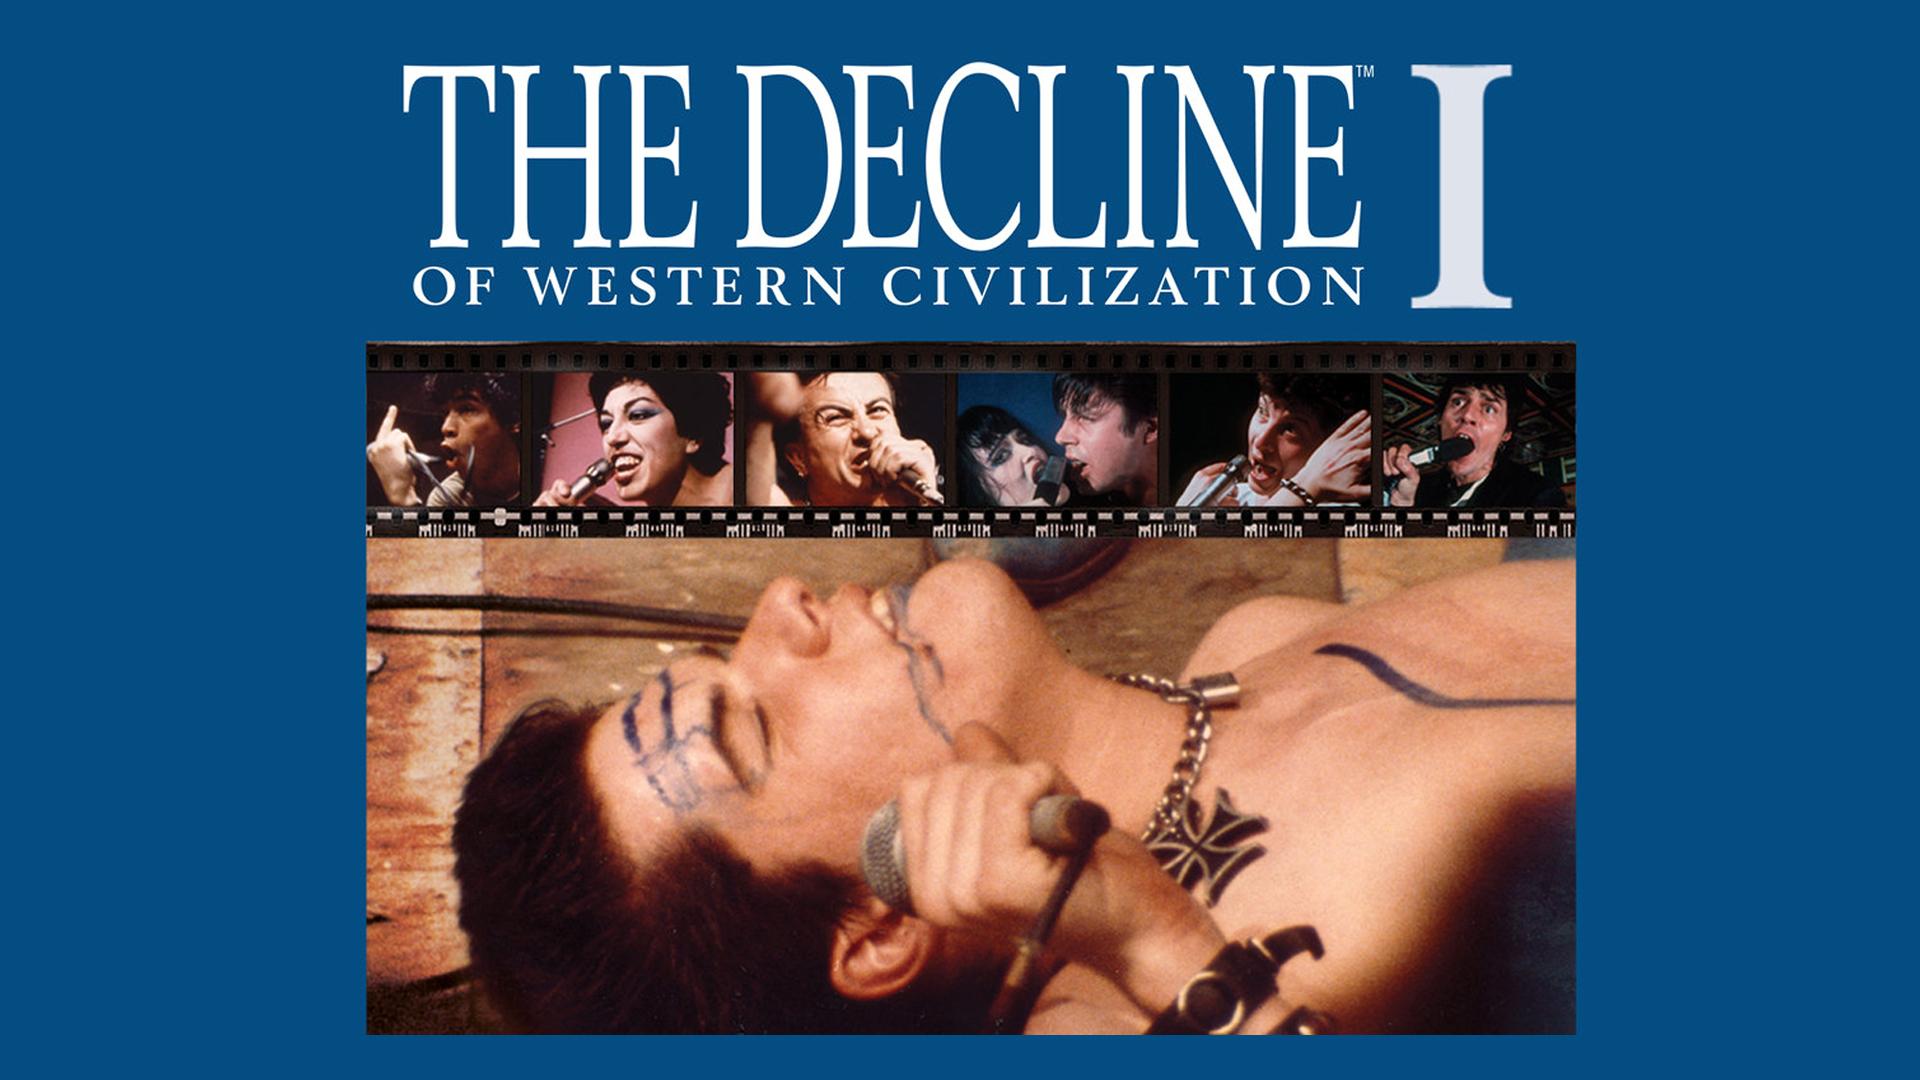 The Decline of Western Civilization I